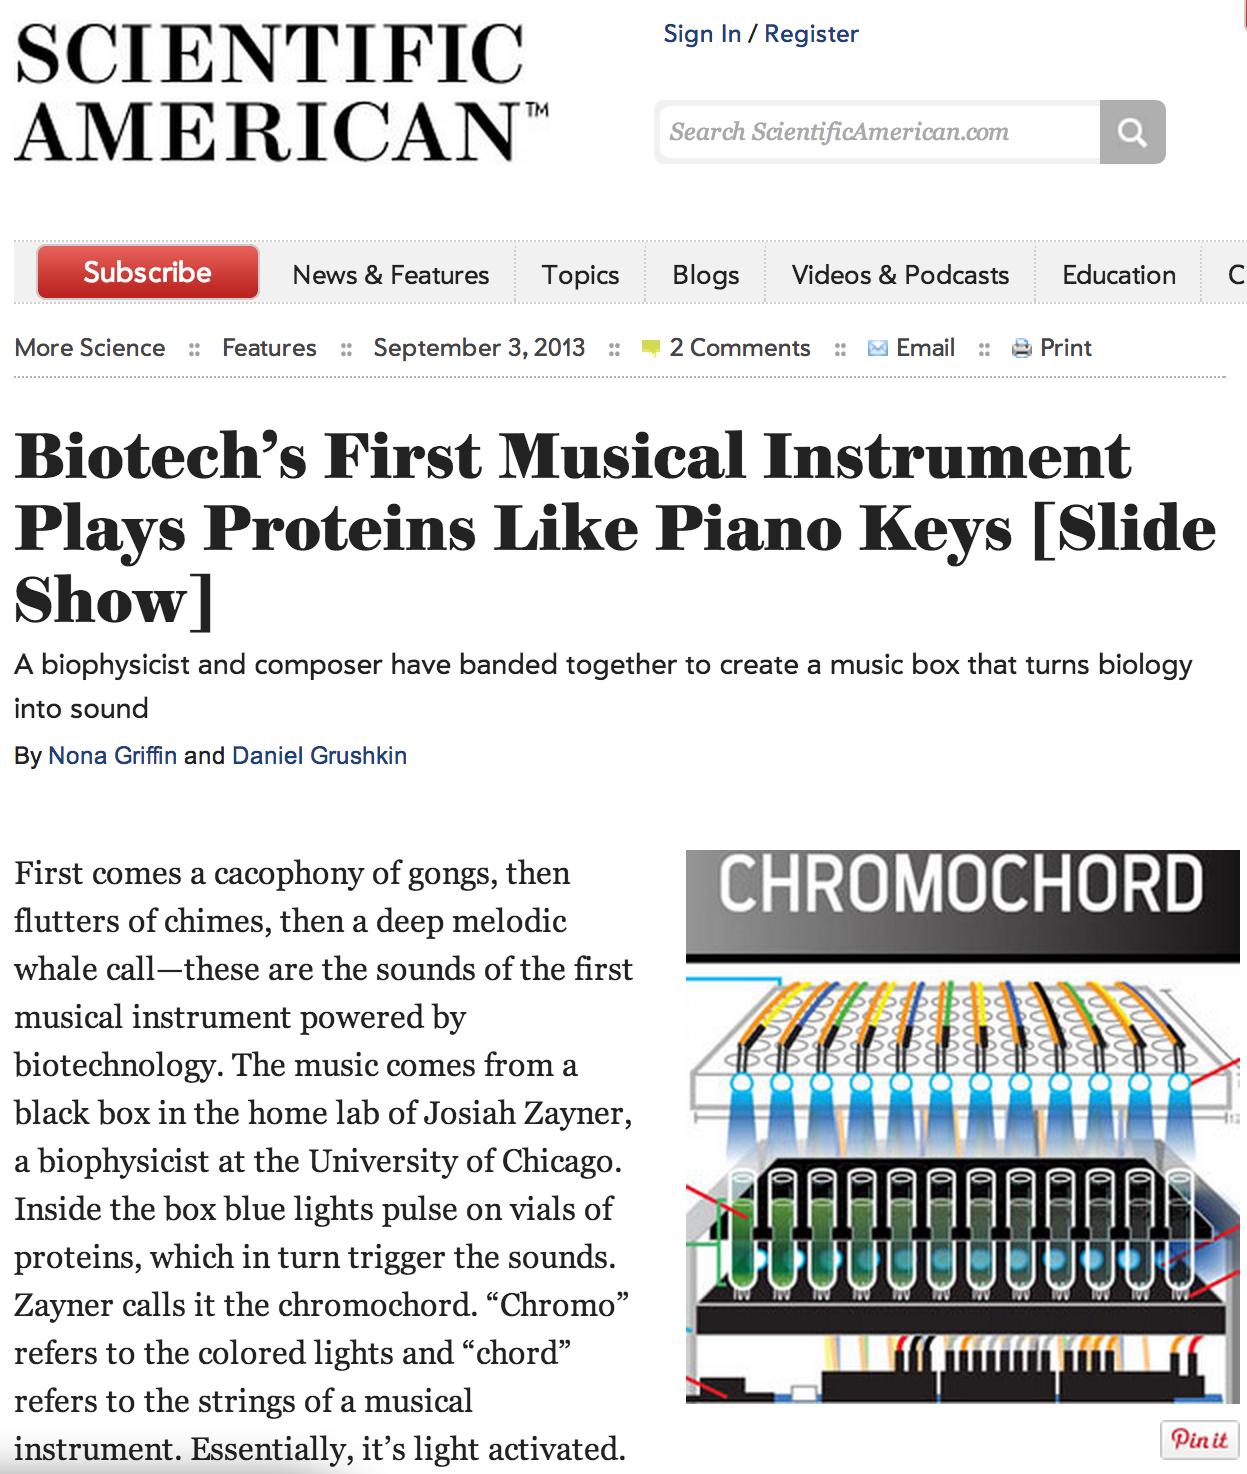 Chromochord featured in Scientific American